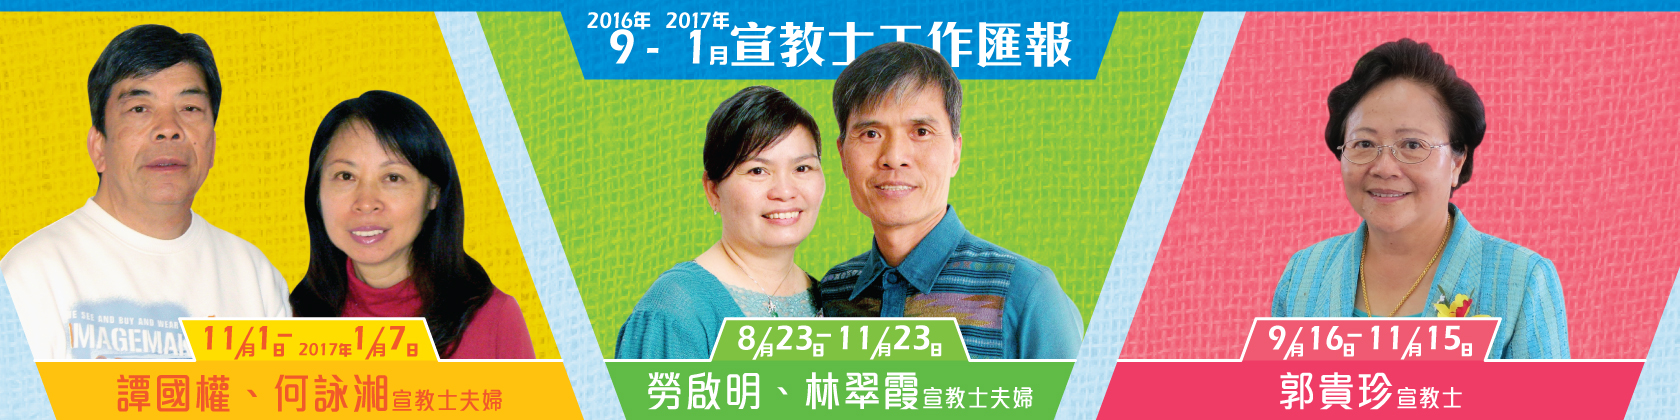 CB-宣教分享會-02_web-banner-1680-x-420-011